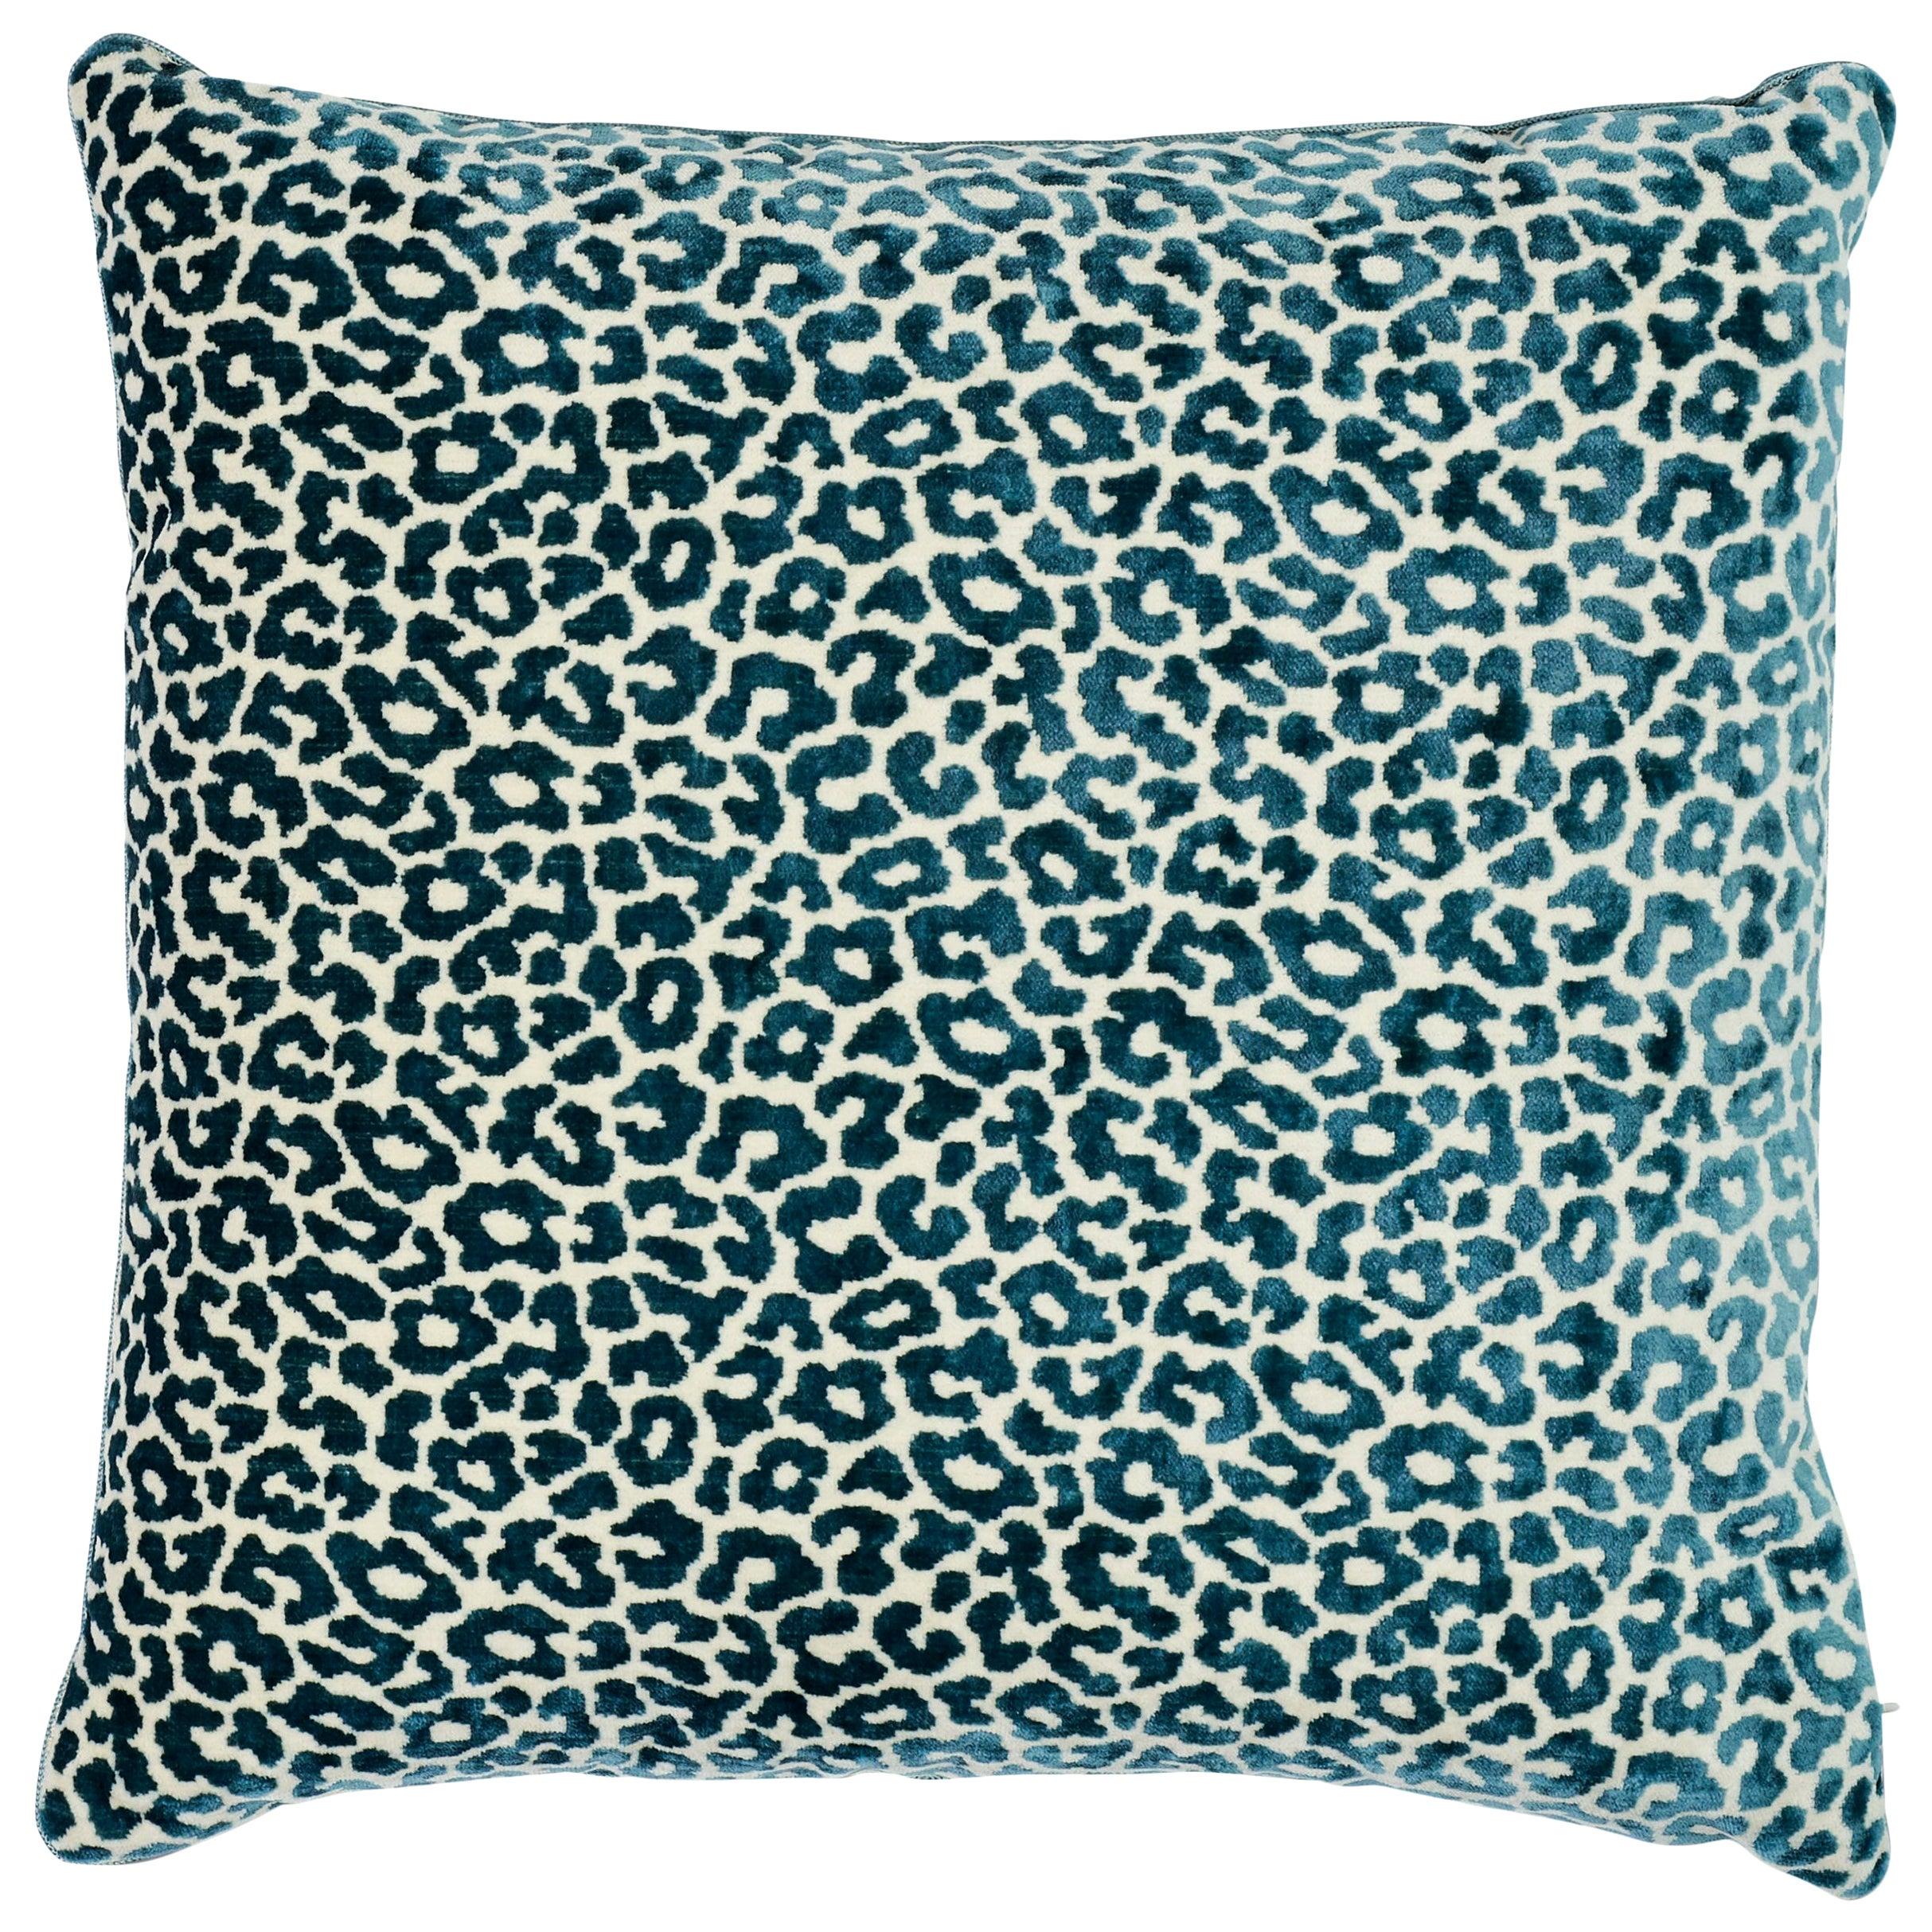 Schumacher Madeleine Cadet Two-Sided Velvet Pillow